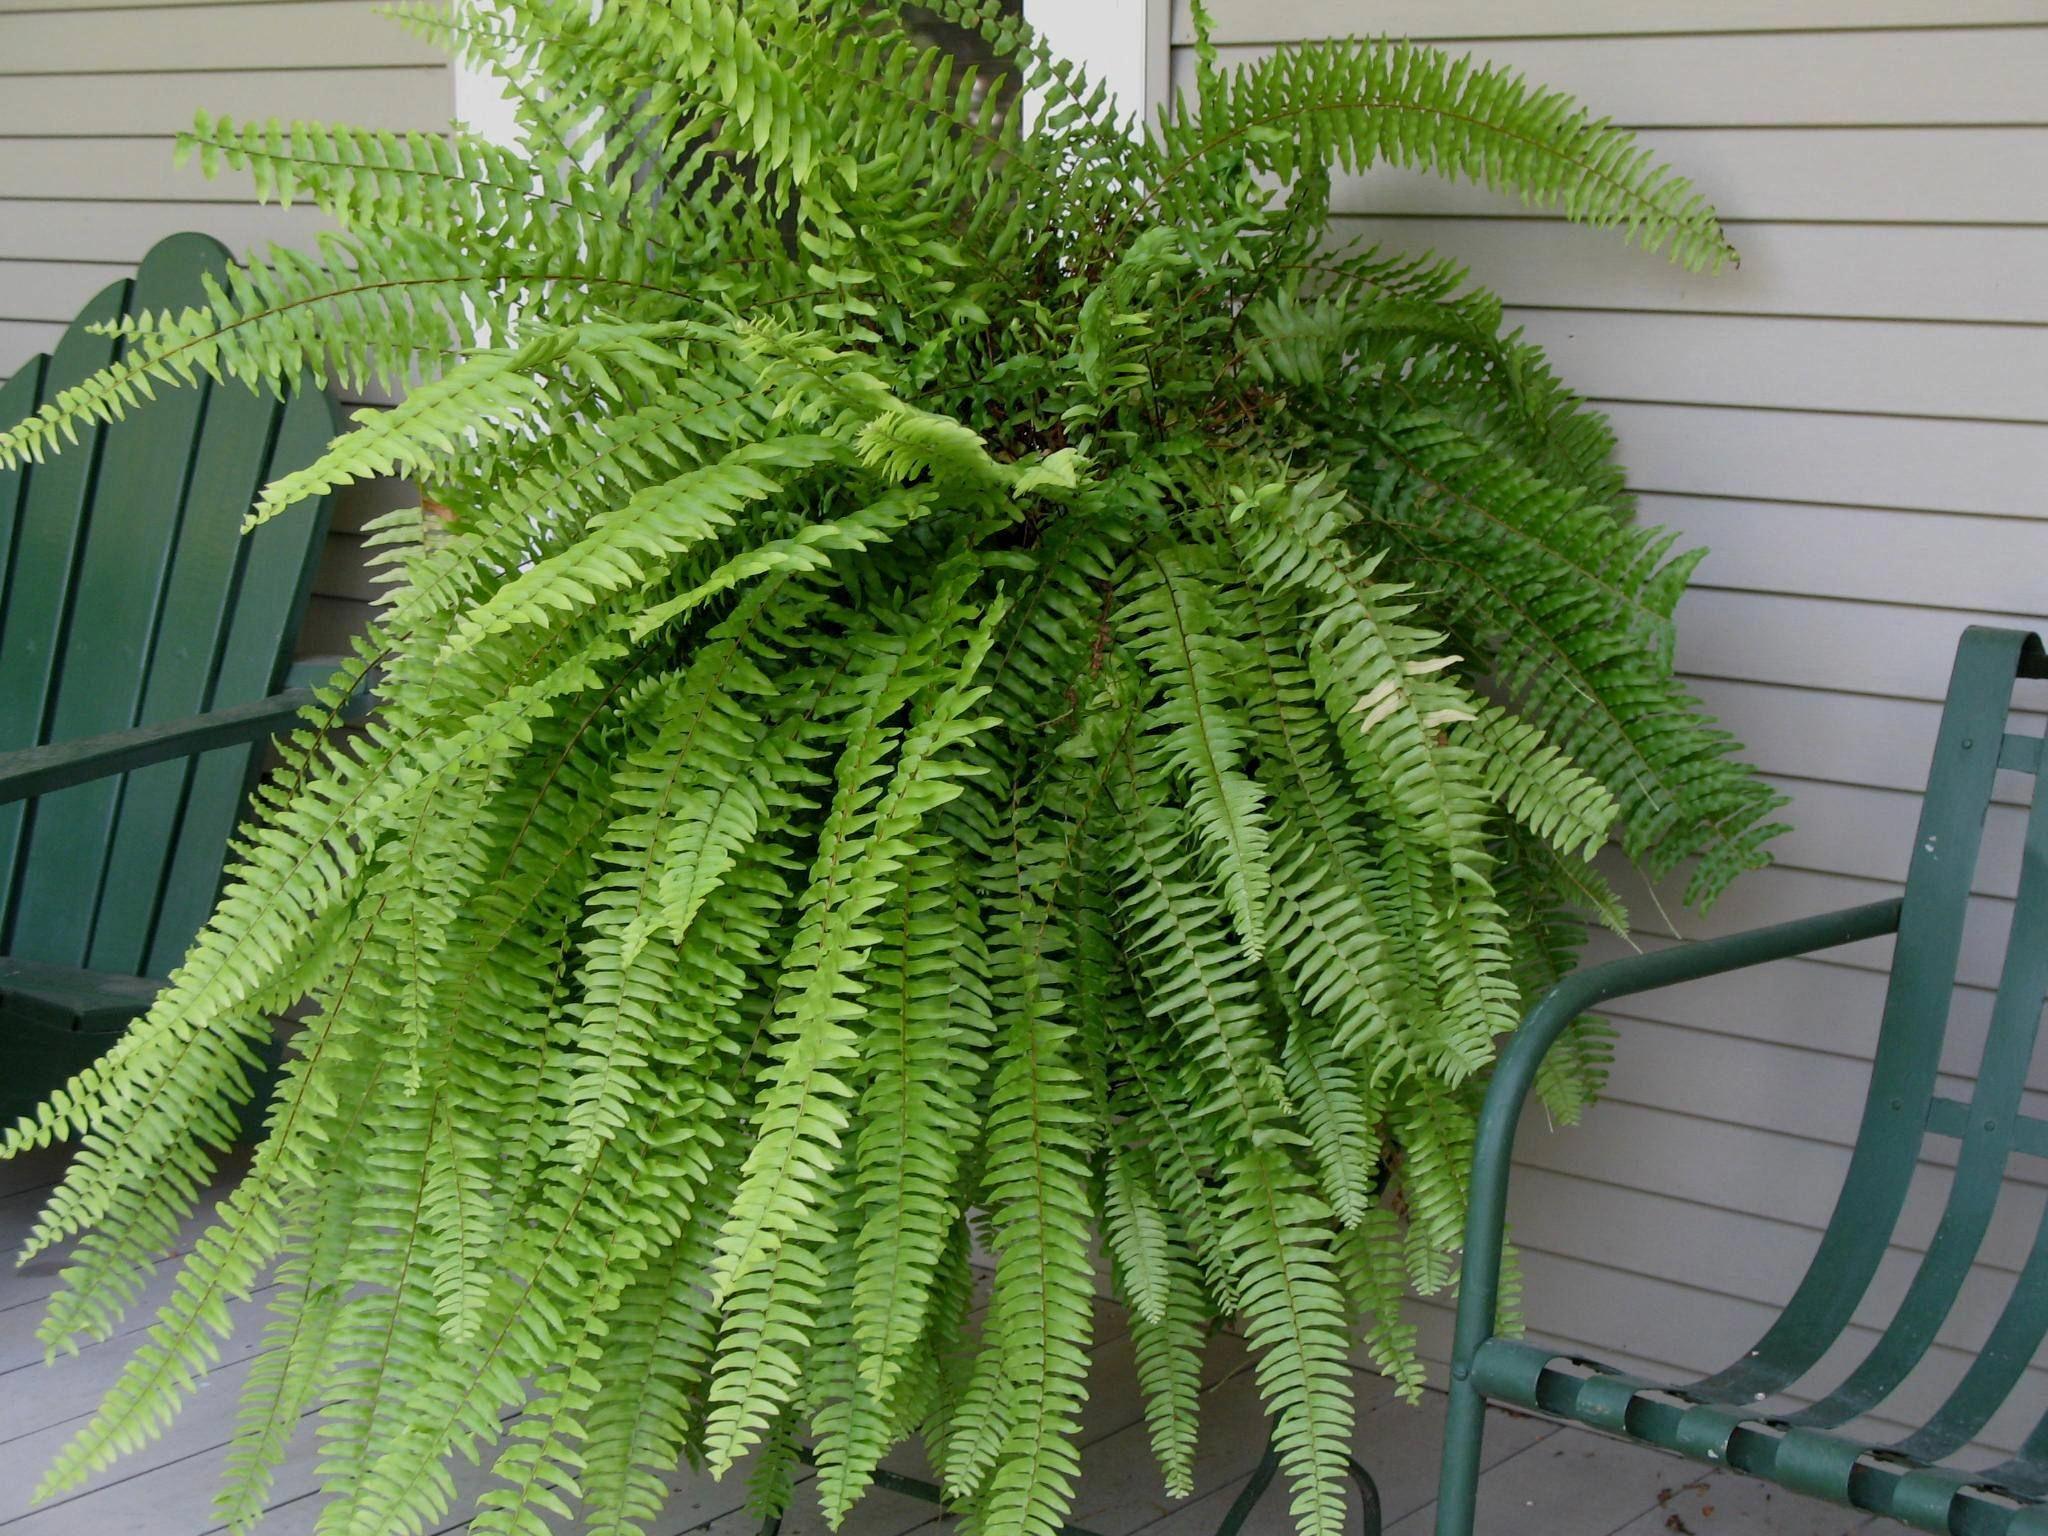 The Boston fern, Nephrolepis exalta bostoniensis cat